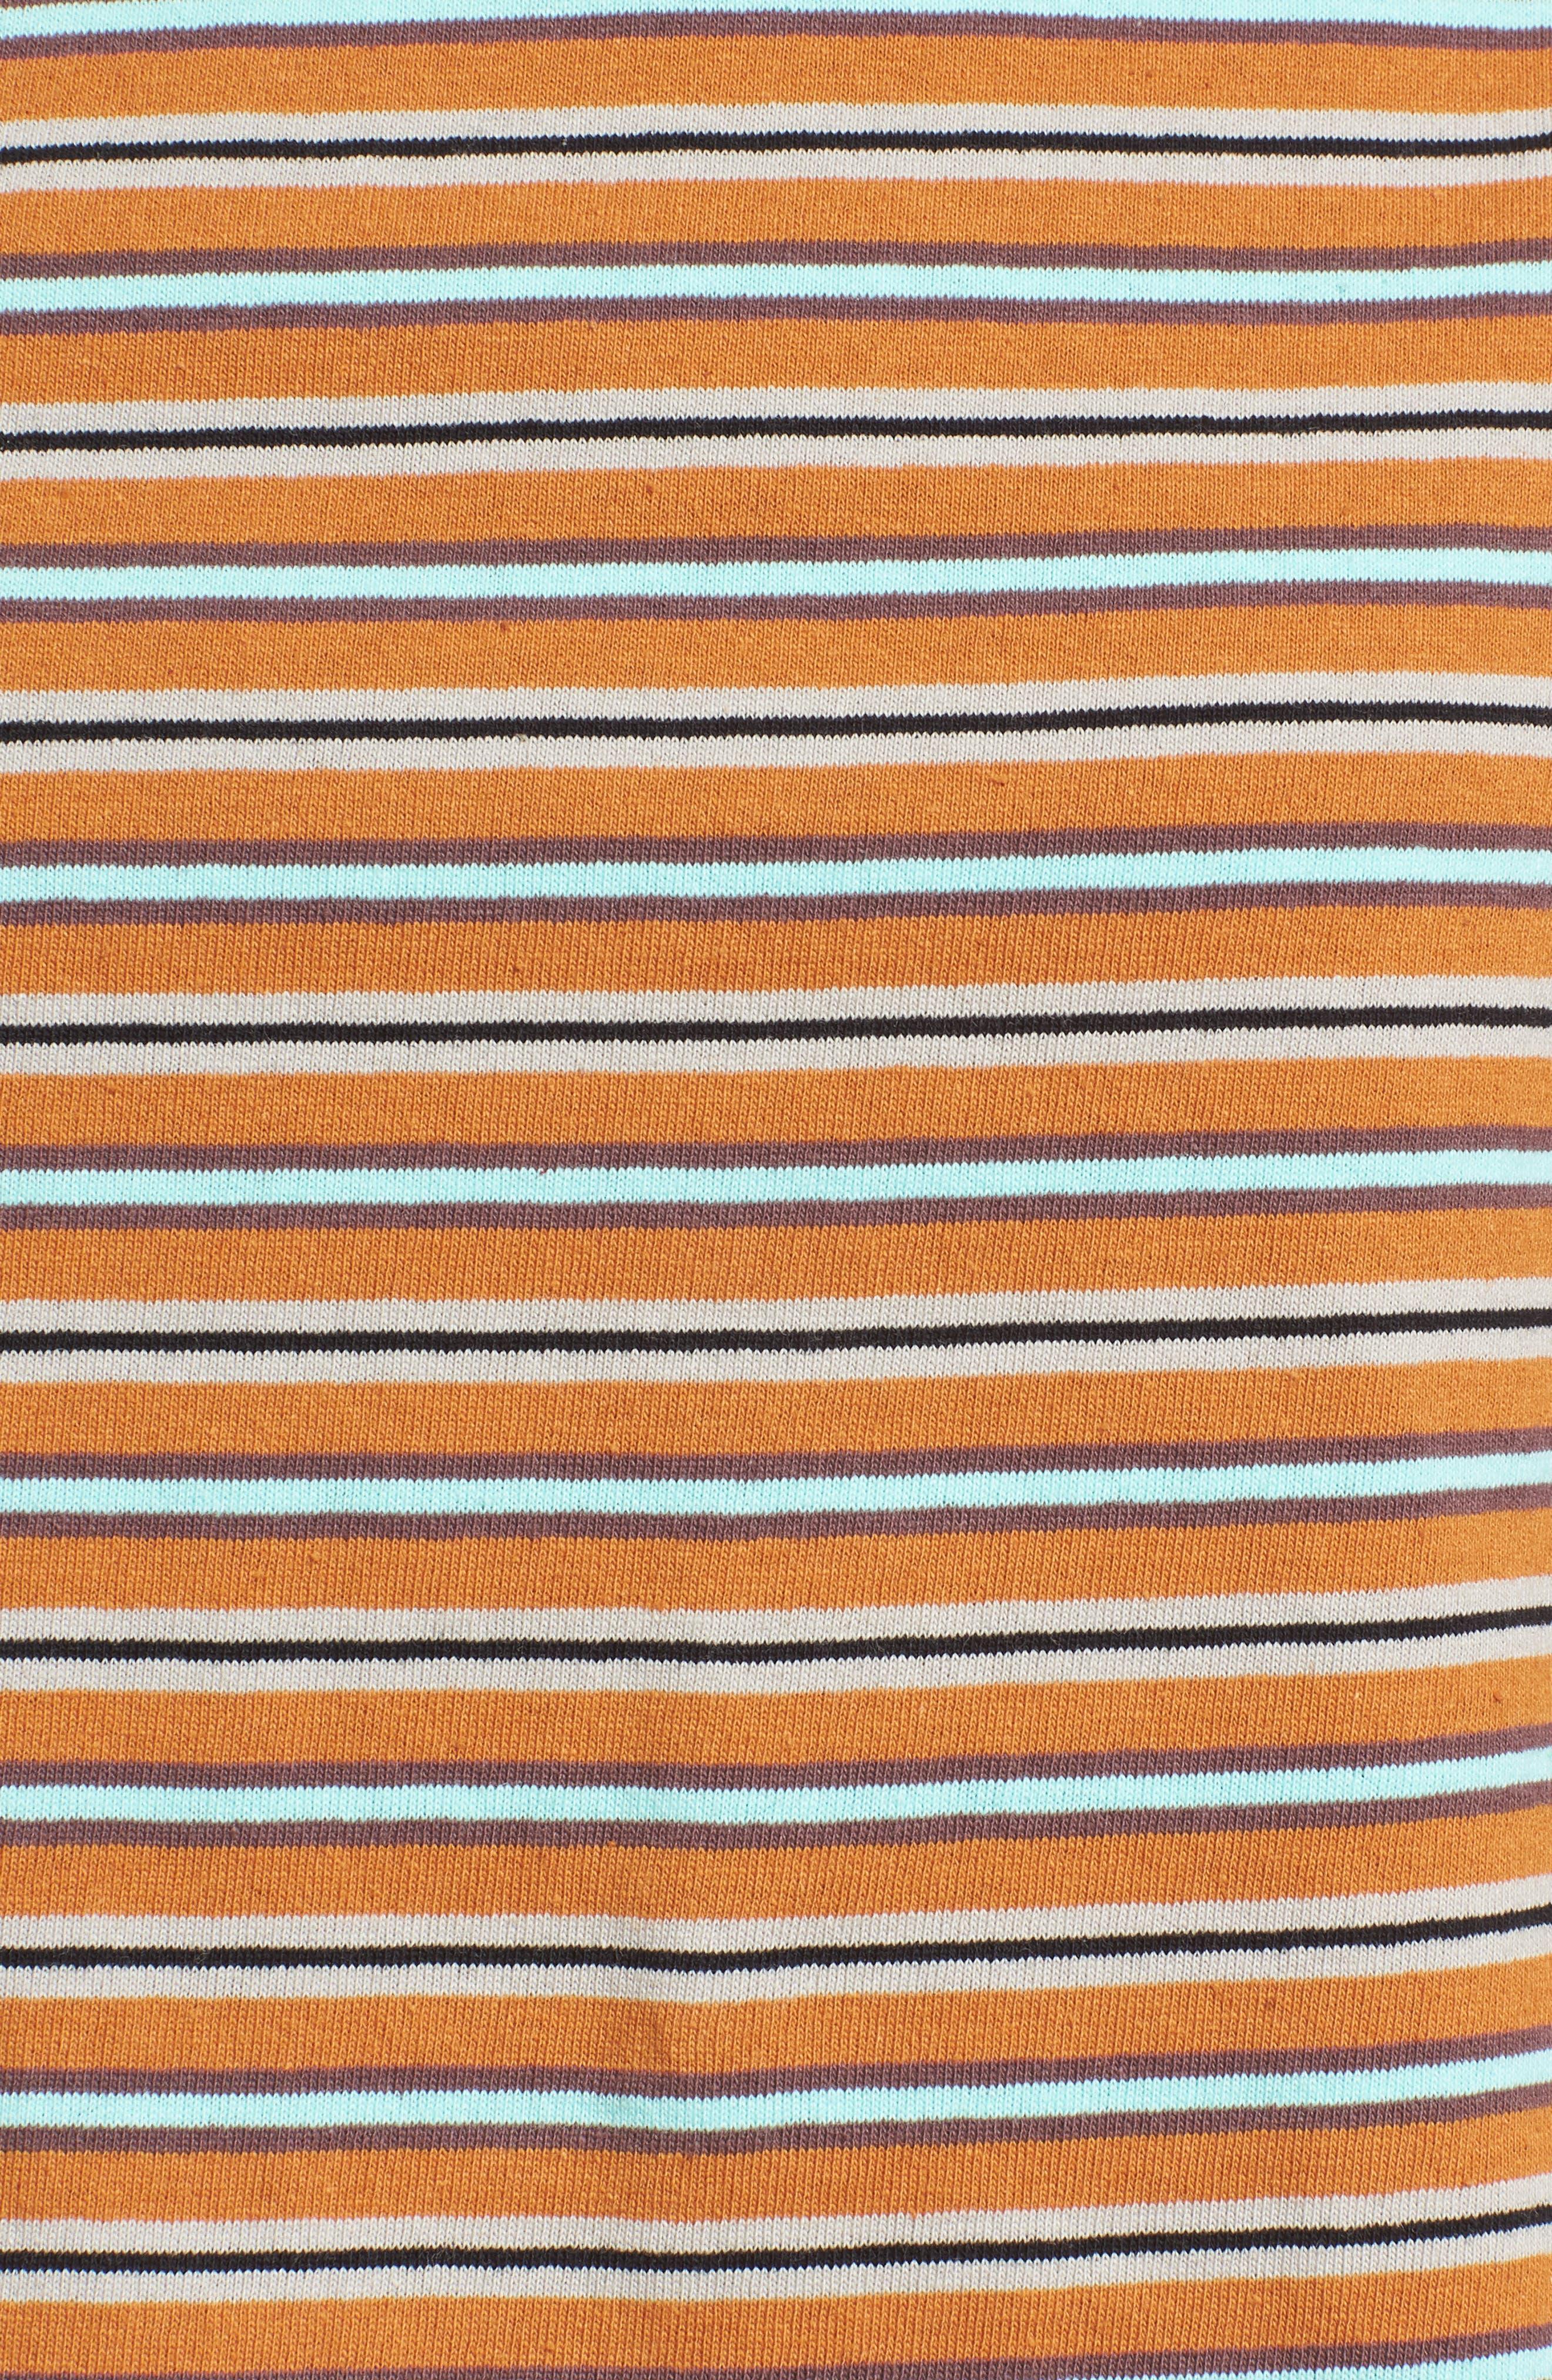 Stripe Crop Tee,                             Alternate thumbnail 15, color,